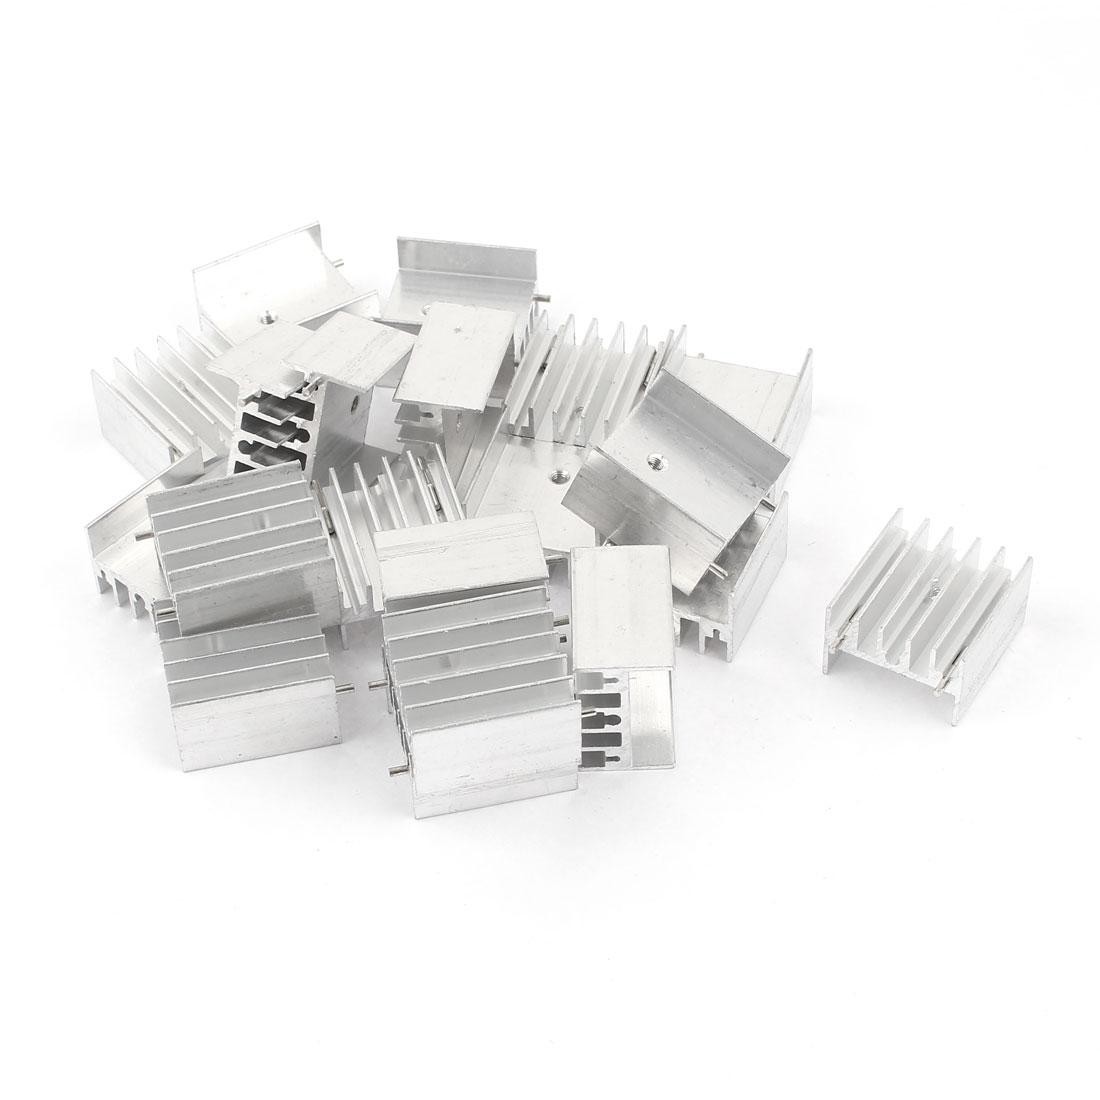 20 x Silver Tone 25x23x16mm Aluminum Heatsink Radiator + 2 Needles for Mosfet IC